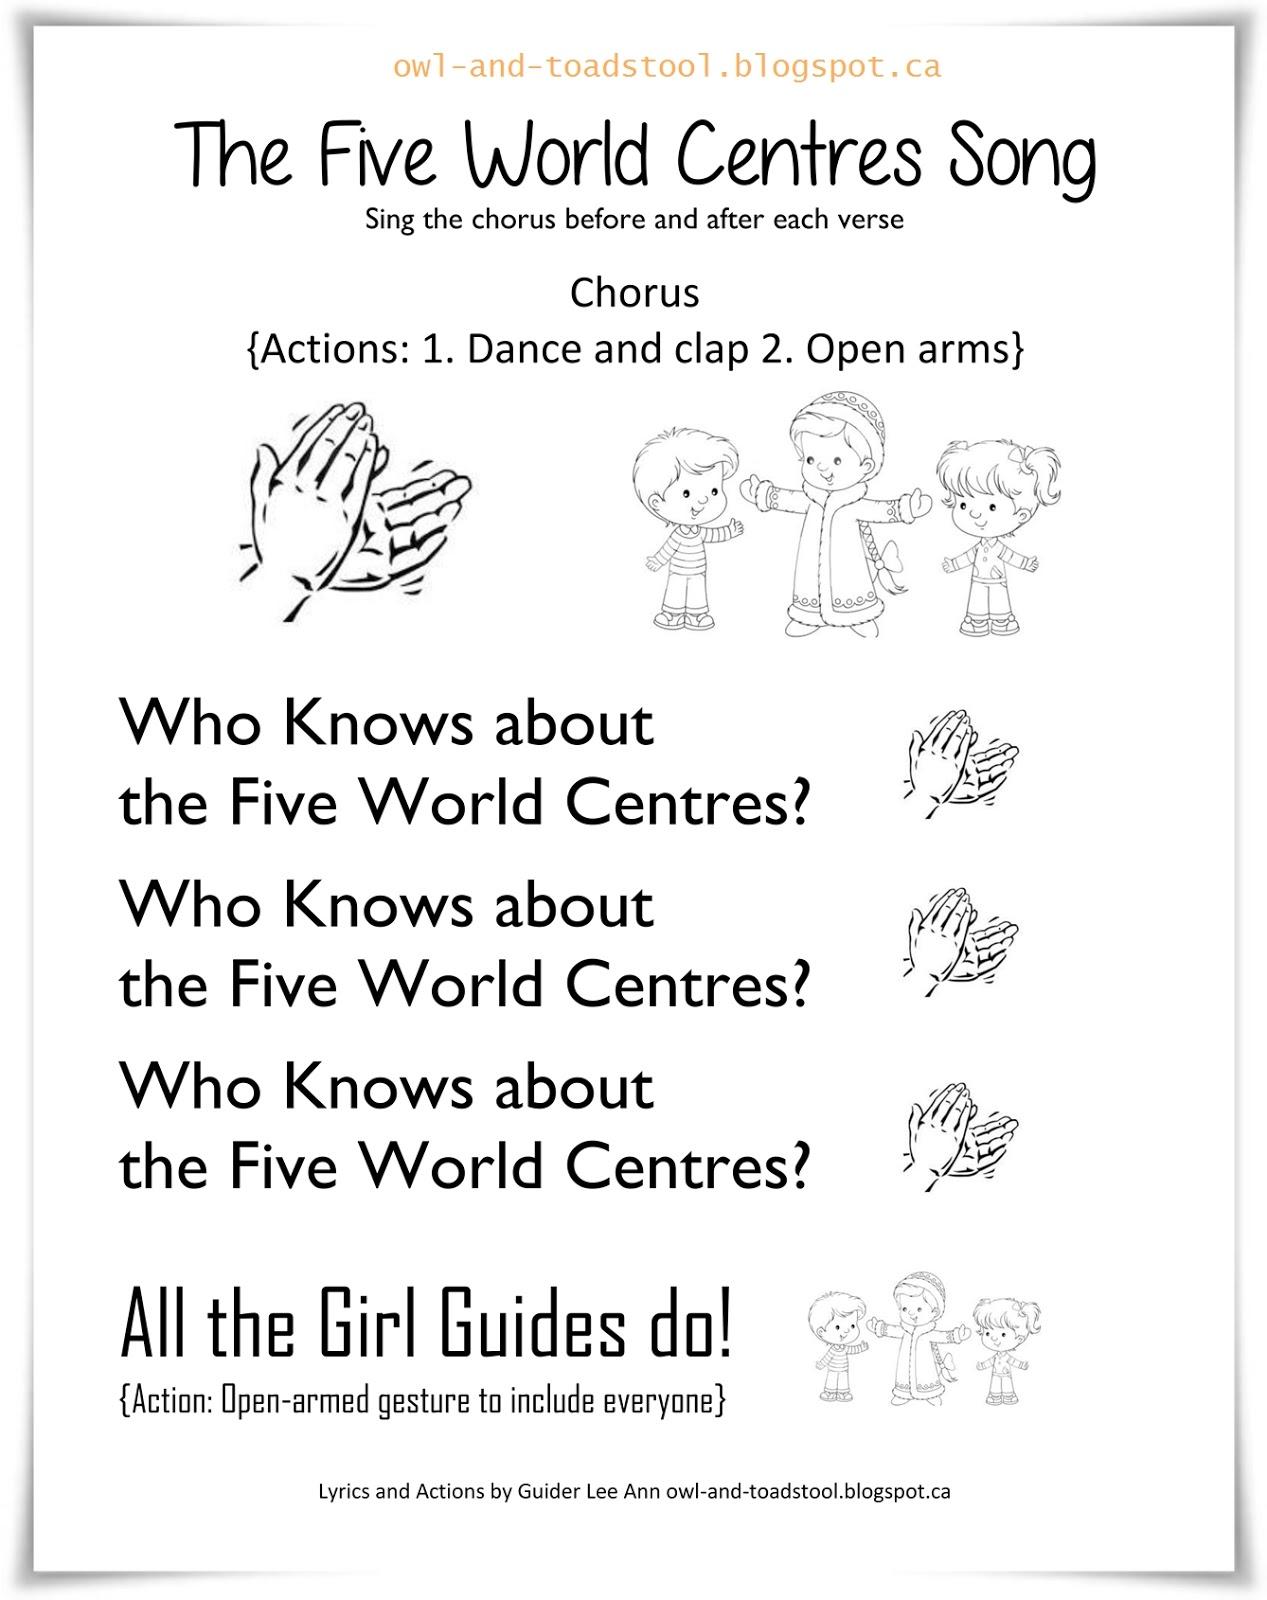 The scout hymn lyrics